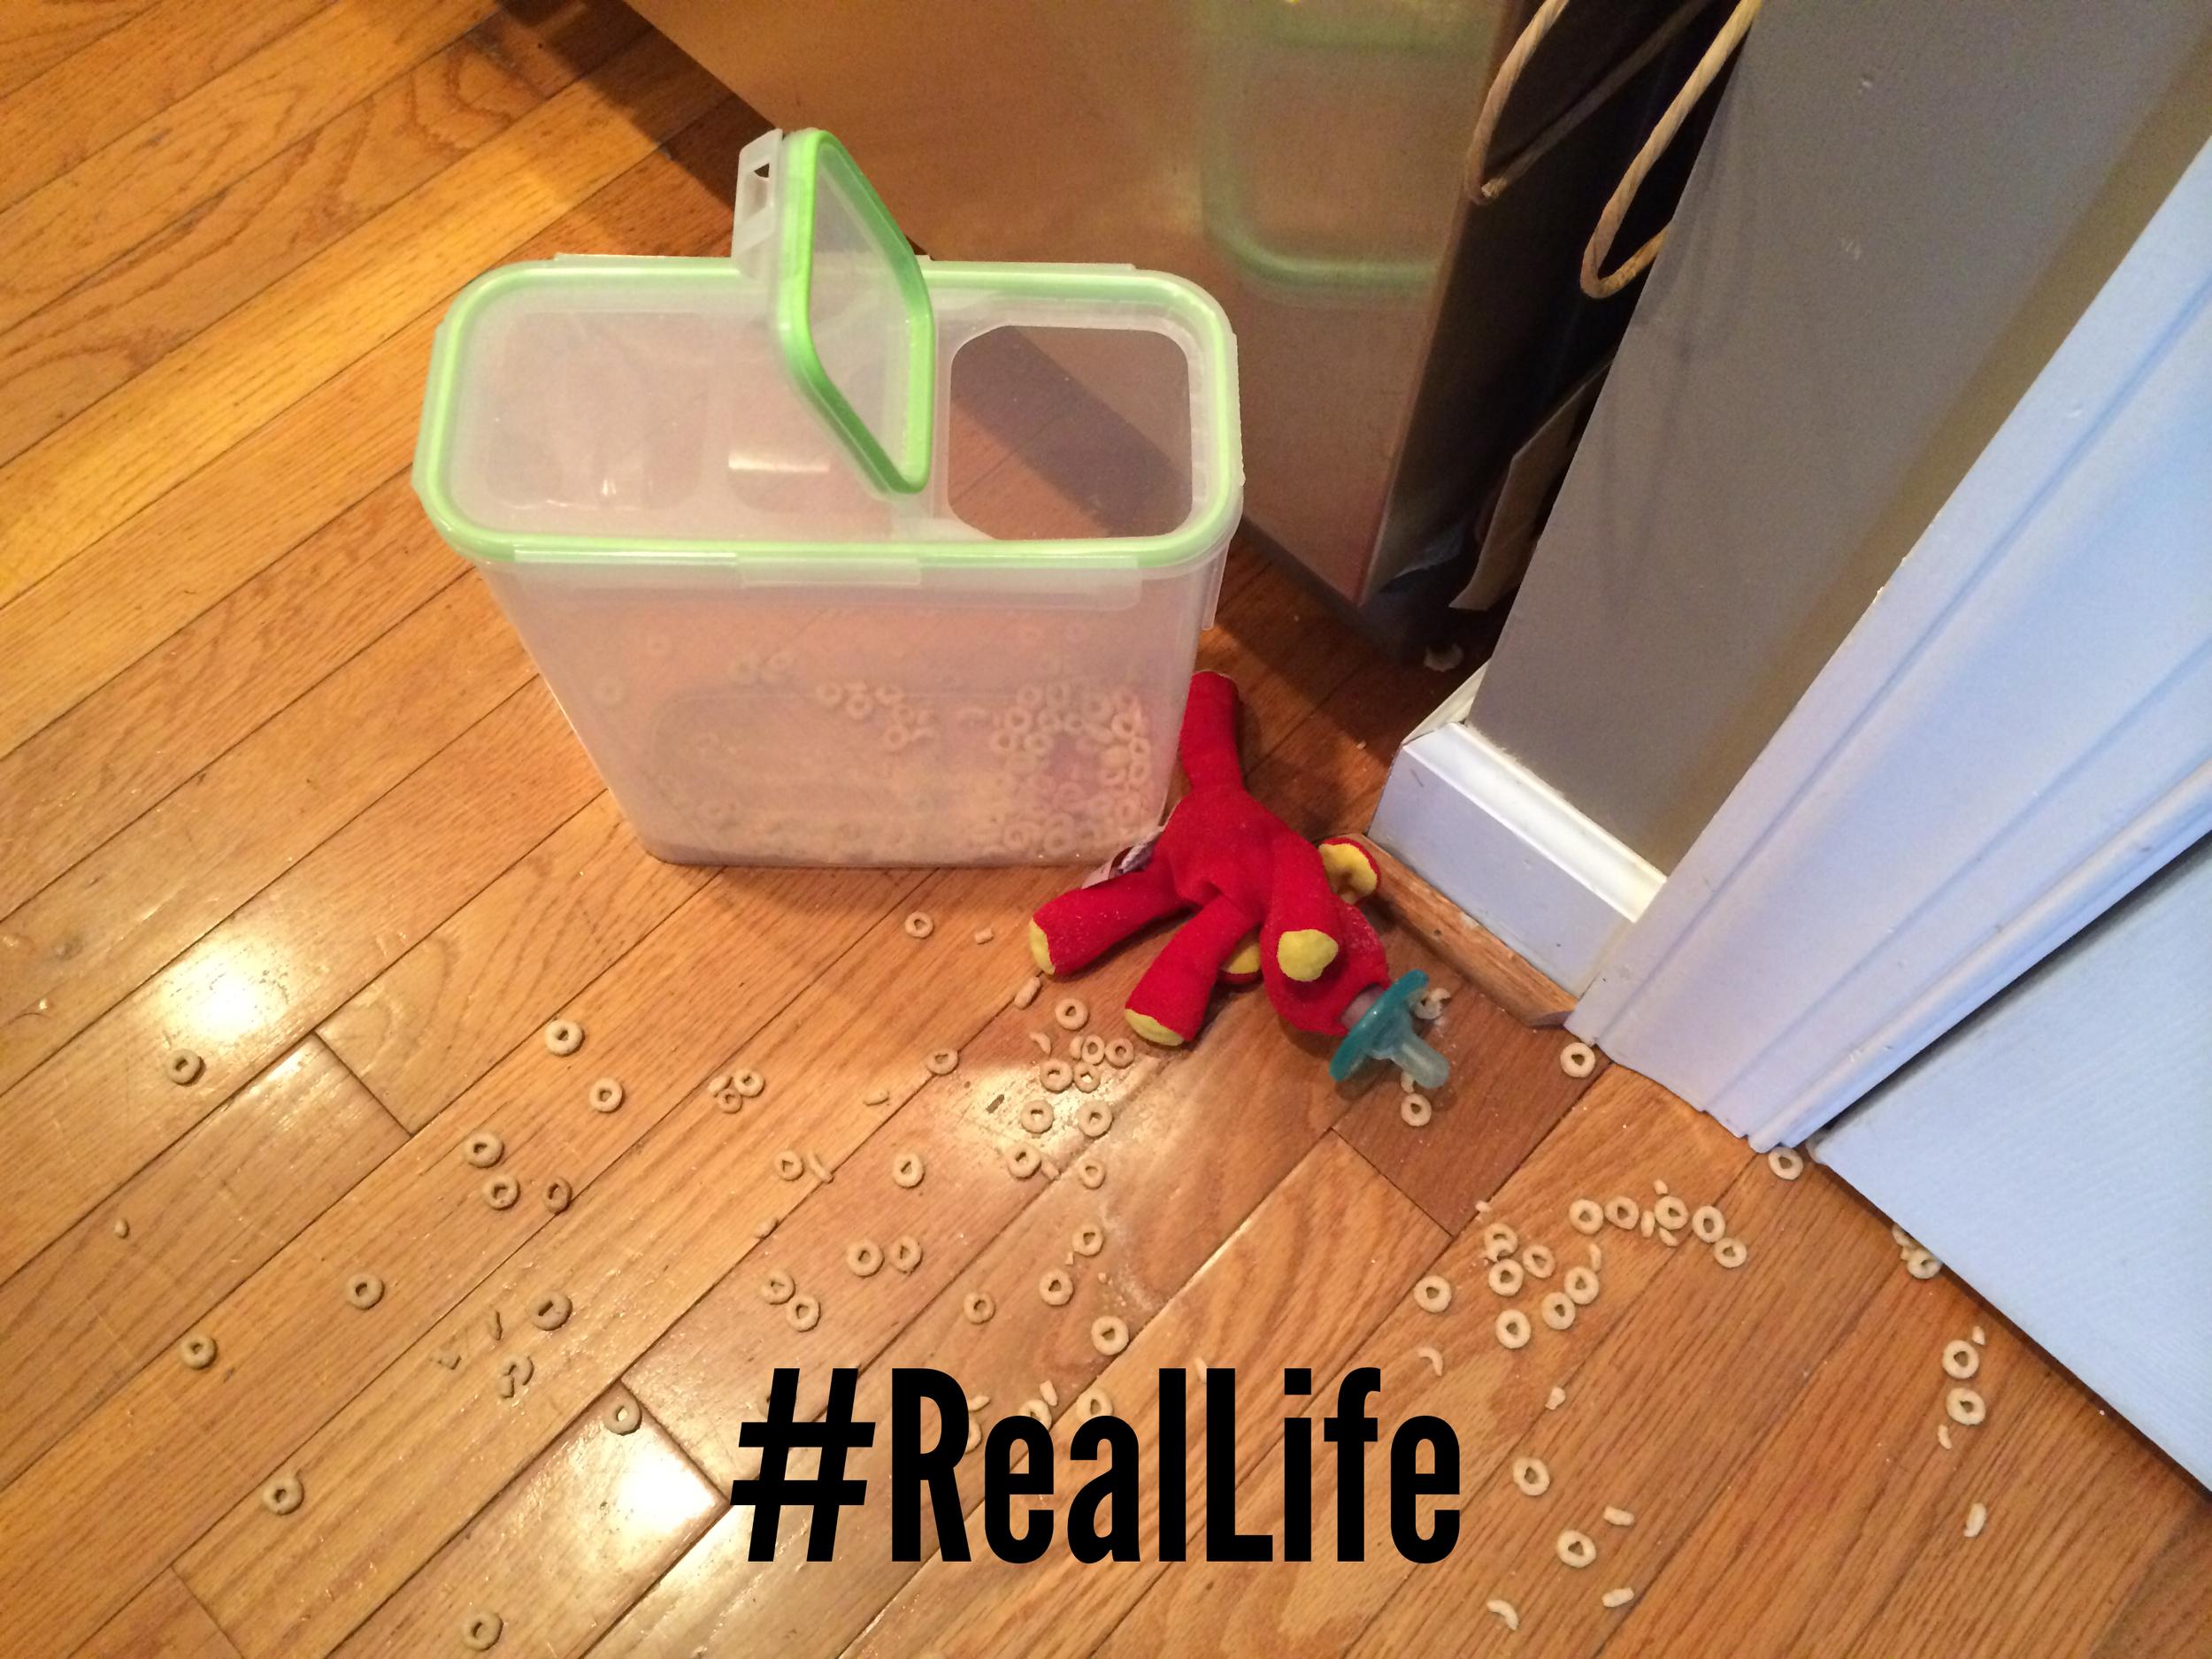 RealLife Cheerios